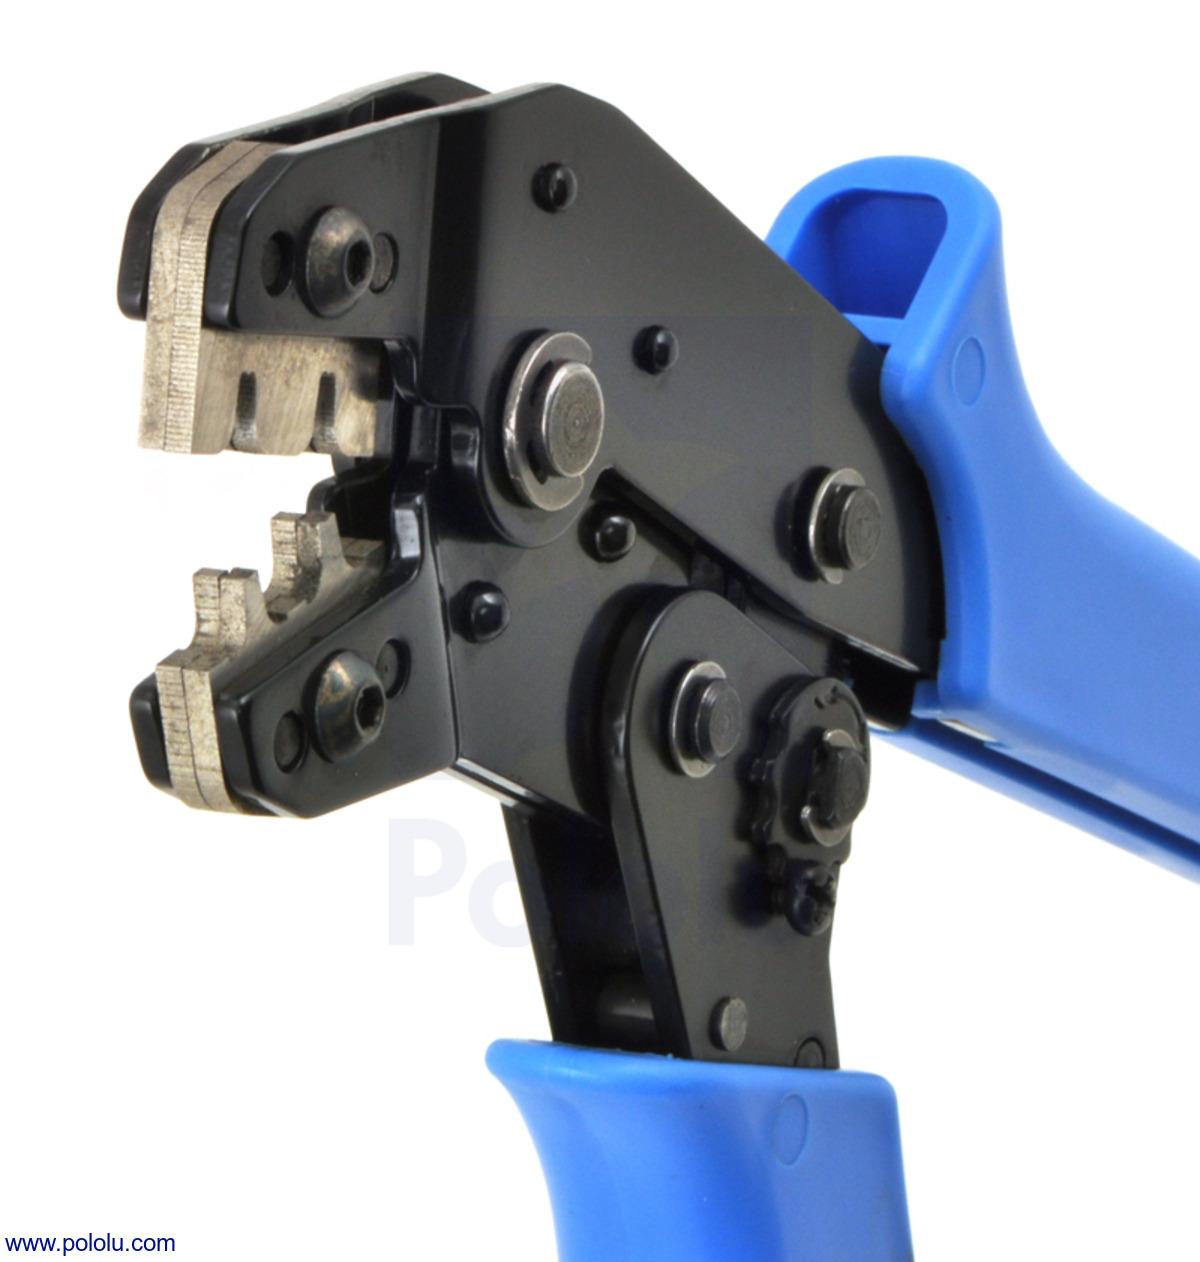 Pololu - Crimping Tool: 0.08-0.5 mm² Capacity, 20-28 AWG